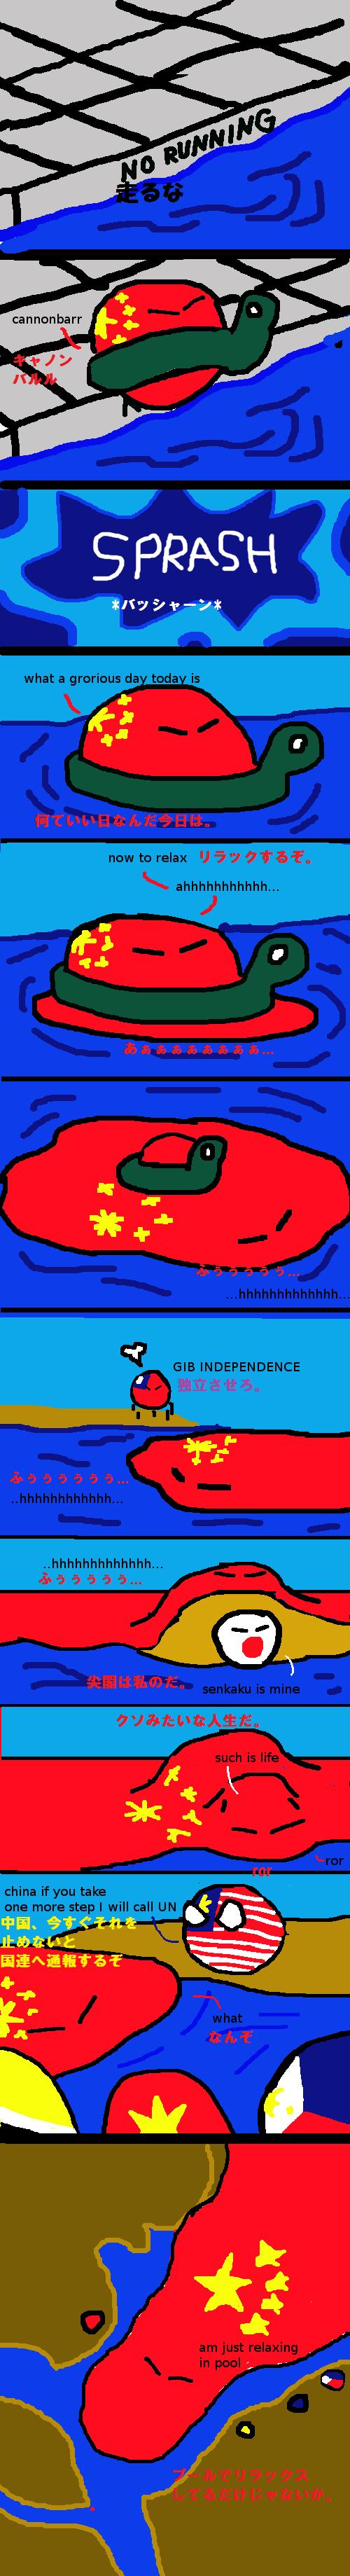 China's pool